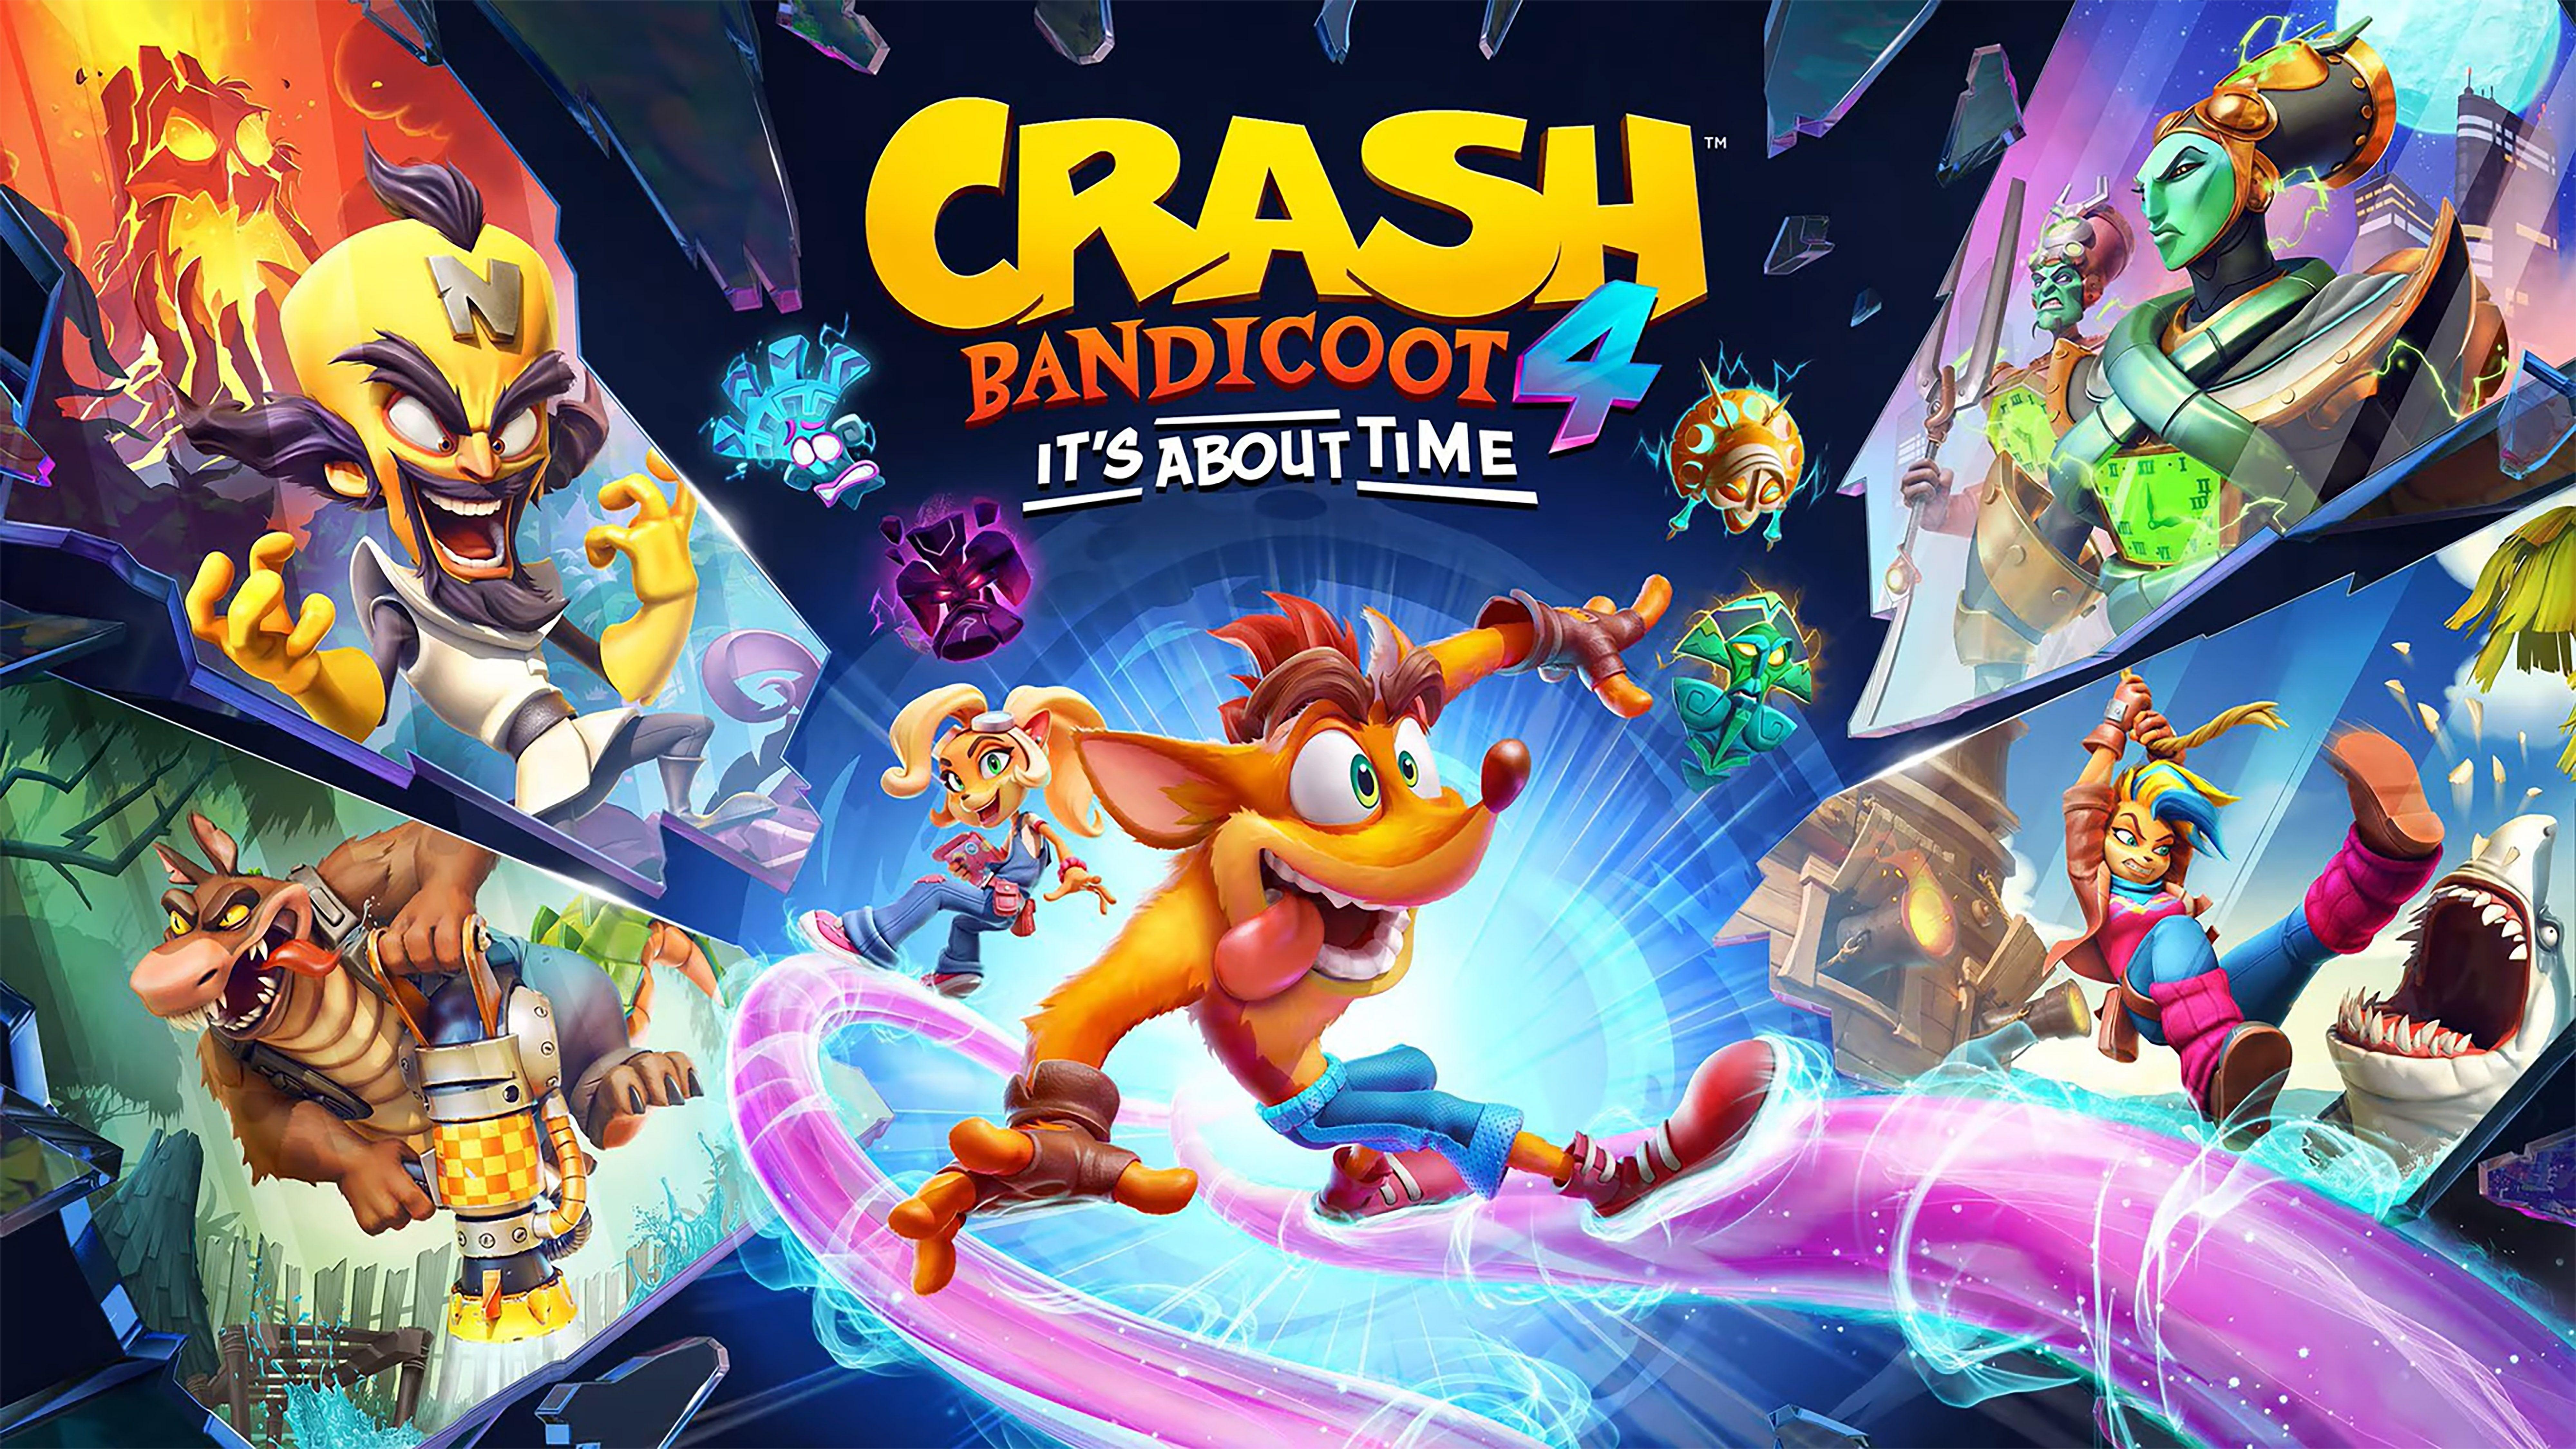 Crash Bandicoot 4 Comes On Pc Ps5 Xsx And Switch In 2021 Crash Bandicoot Characters Crash Bandicoot Crash Bandicoot 4